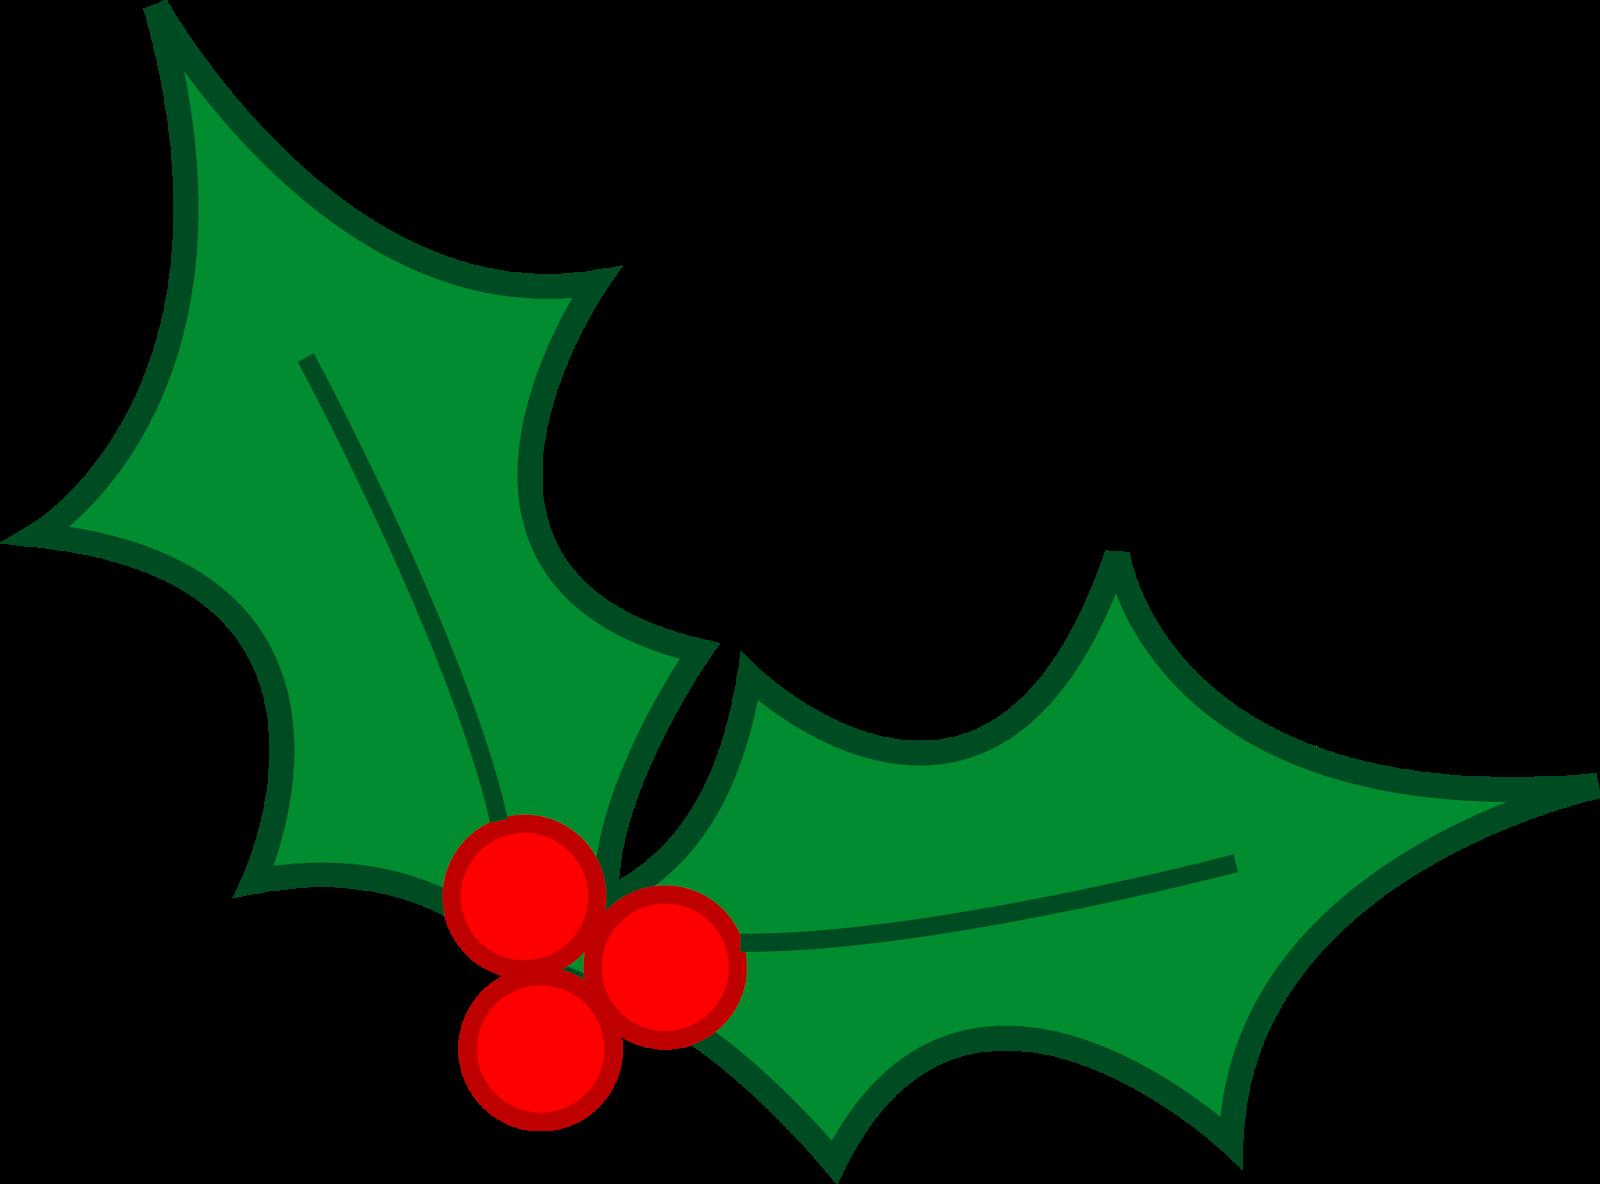 christmas clipart free vector - photo #40